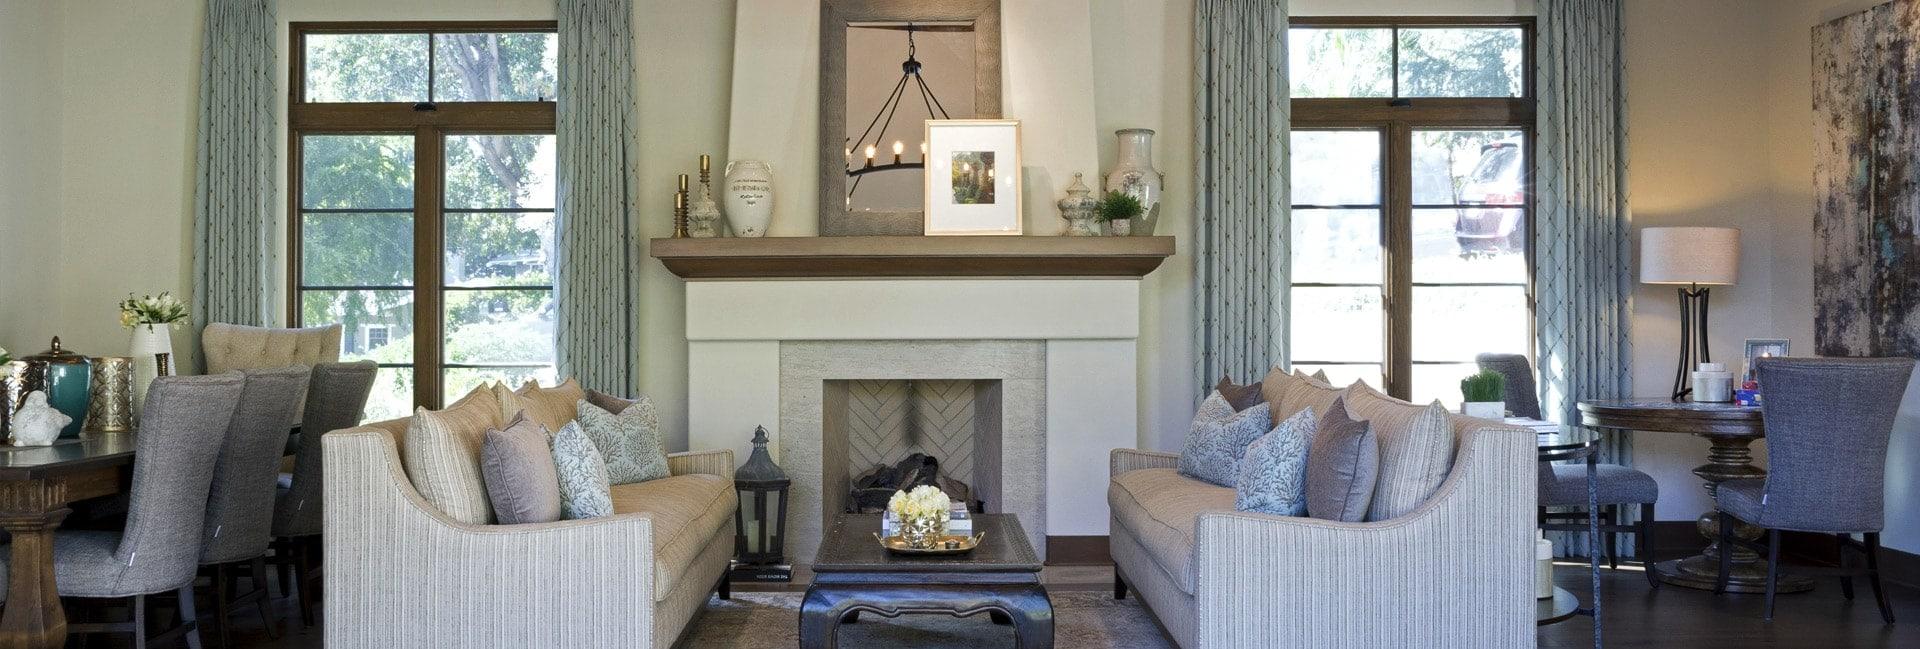 Monrovia Ca Luxury Interior Design